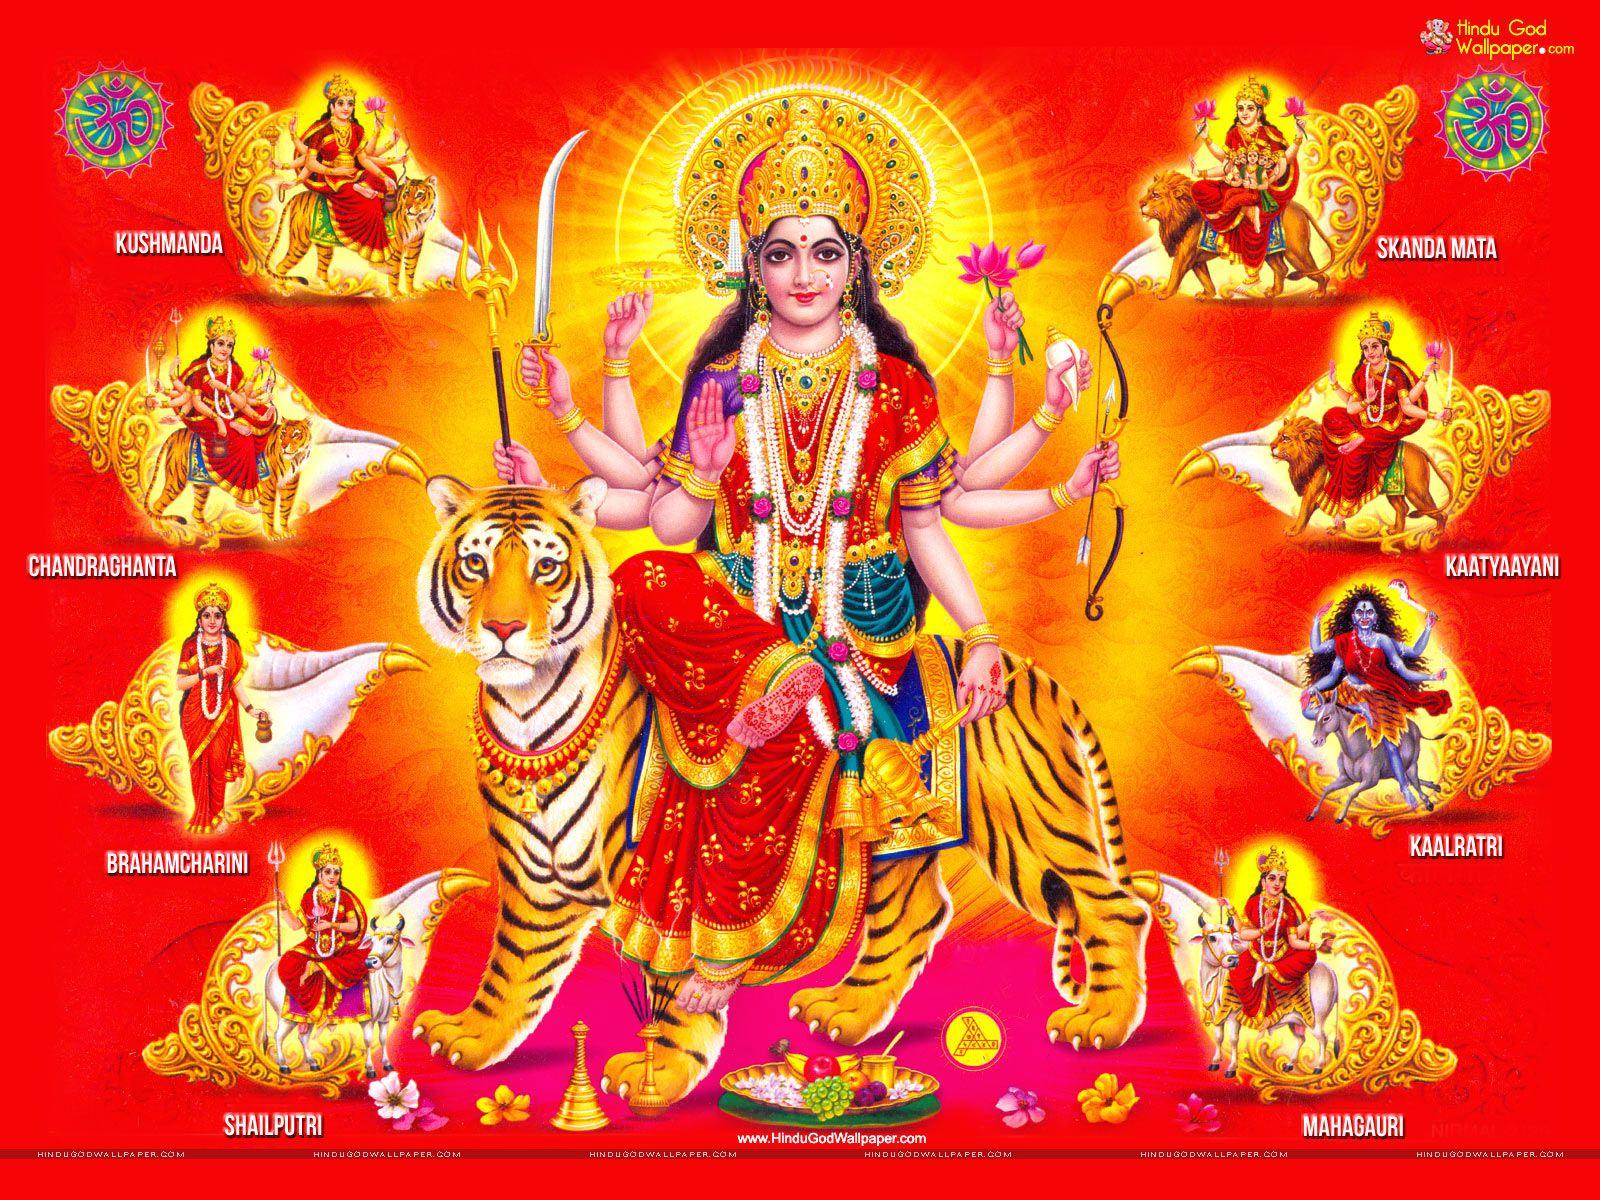 Wallpaper download maa durga - Nav Durga Free Maa Nav Durga Hd Wallpaper Download